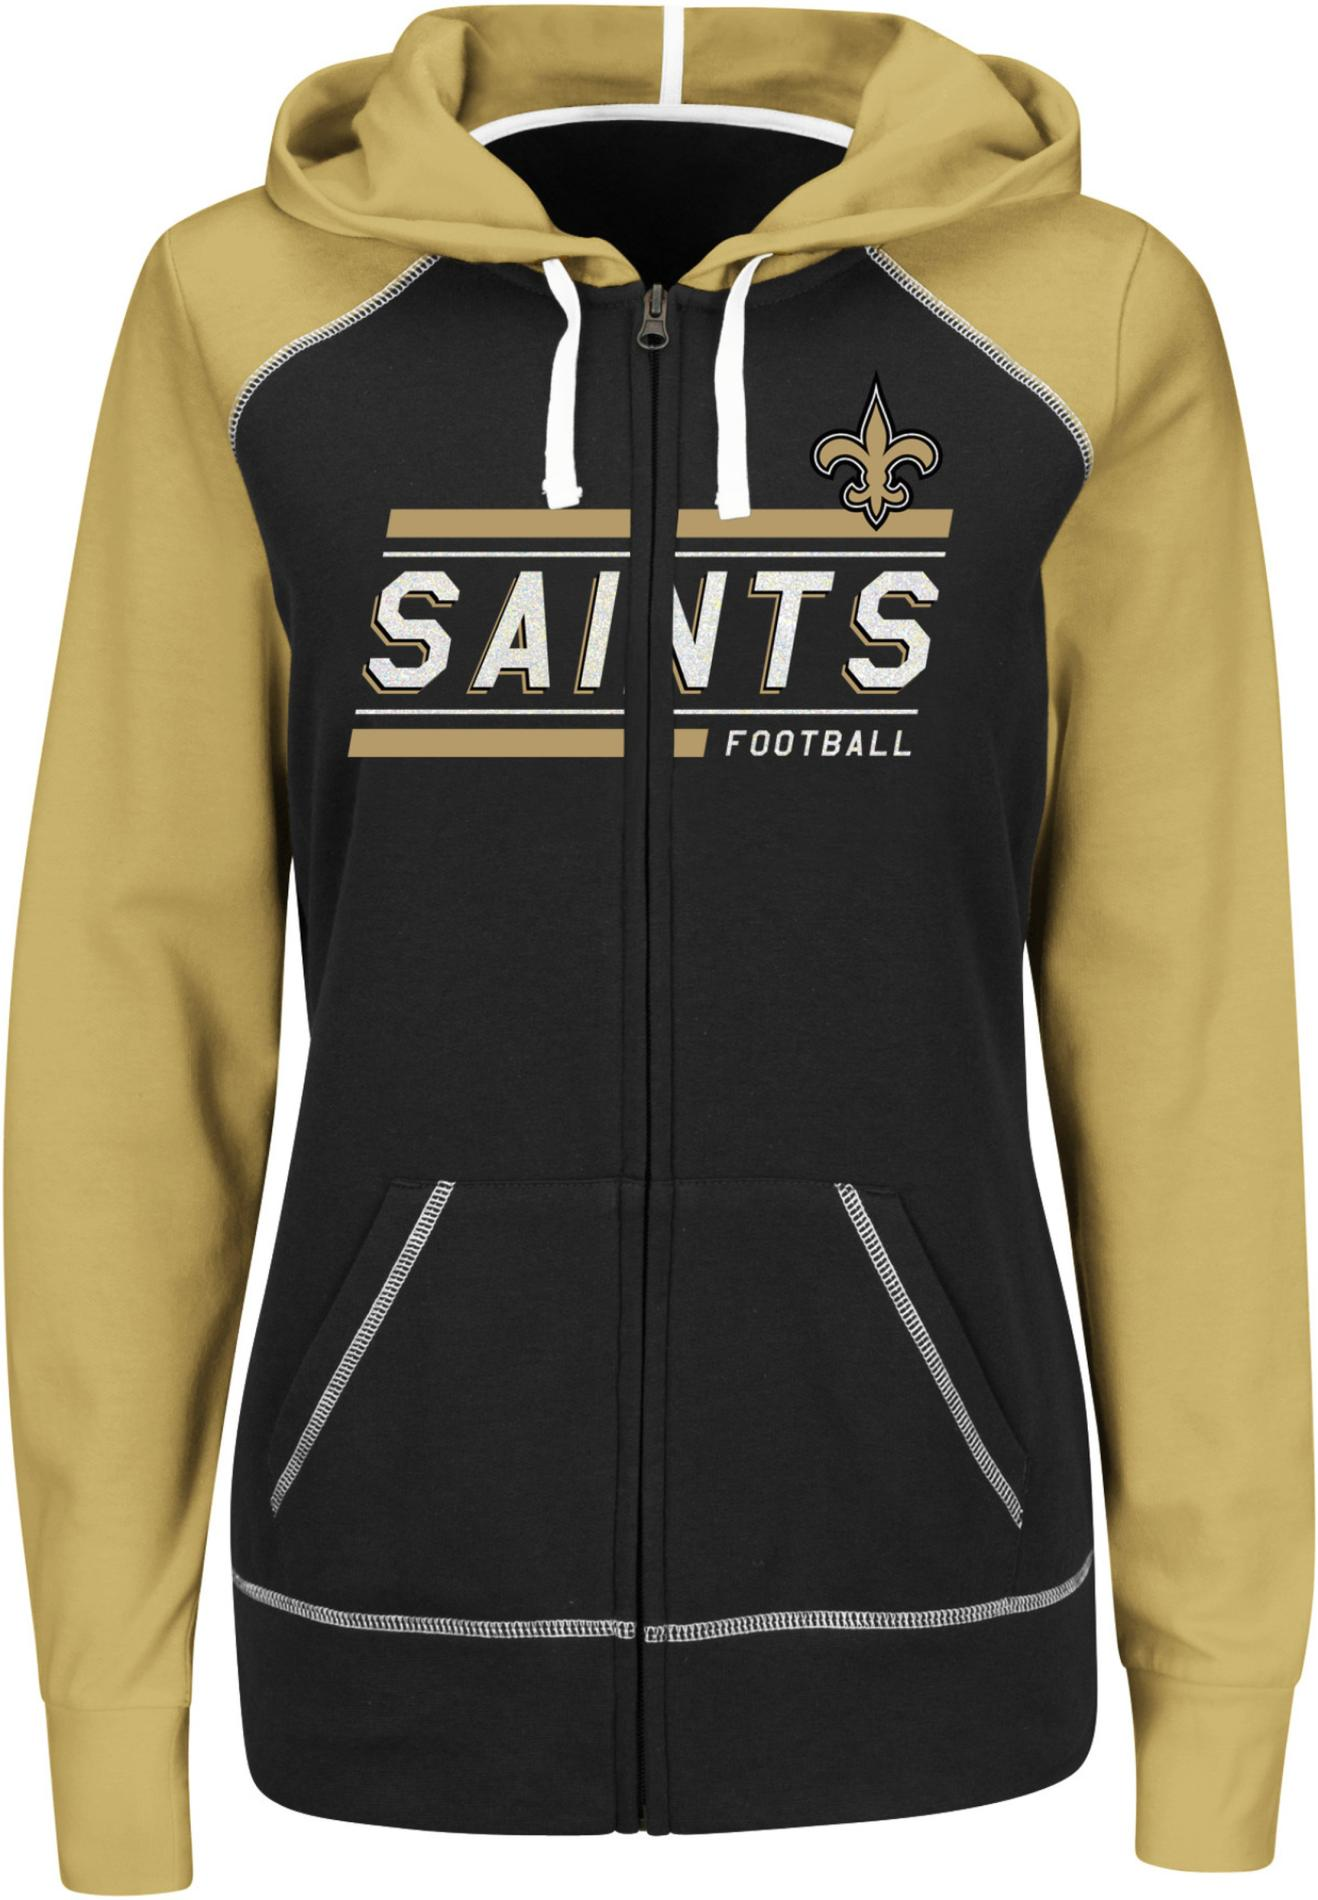 NFL Women's Colorblock Hoodie Jacket - New Orleans Saints PartNumber: 046VA91600212P MfgPartNumber: DBBD-5QX